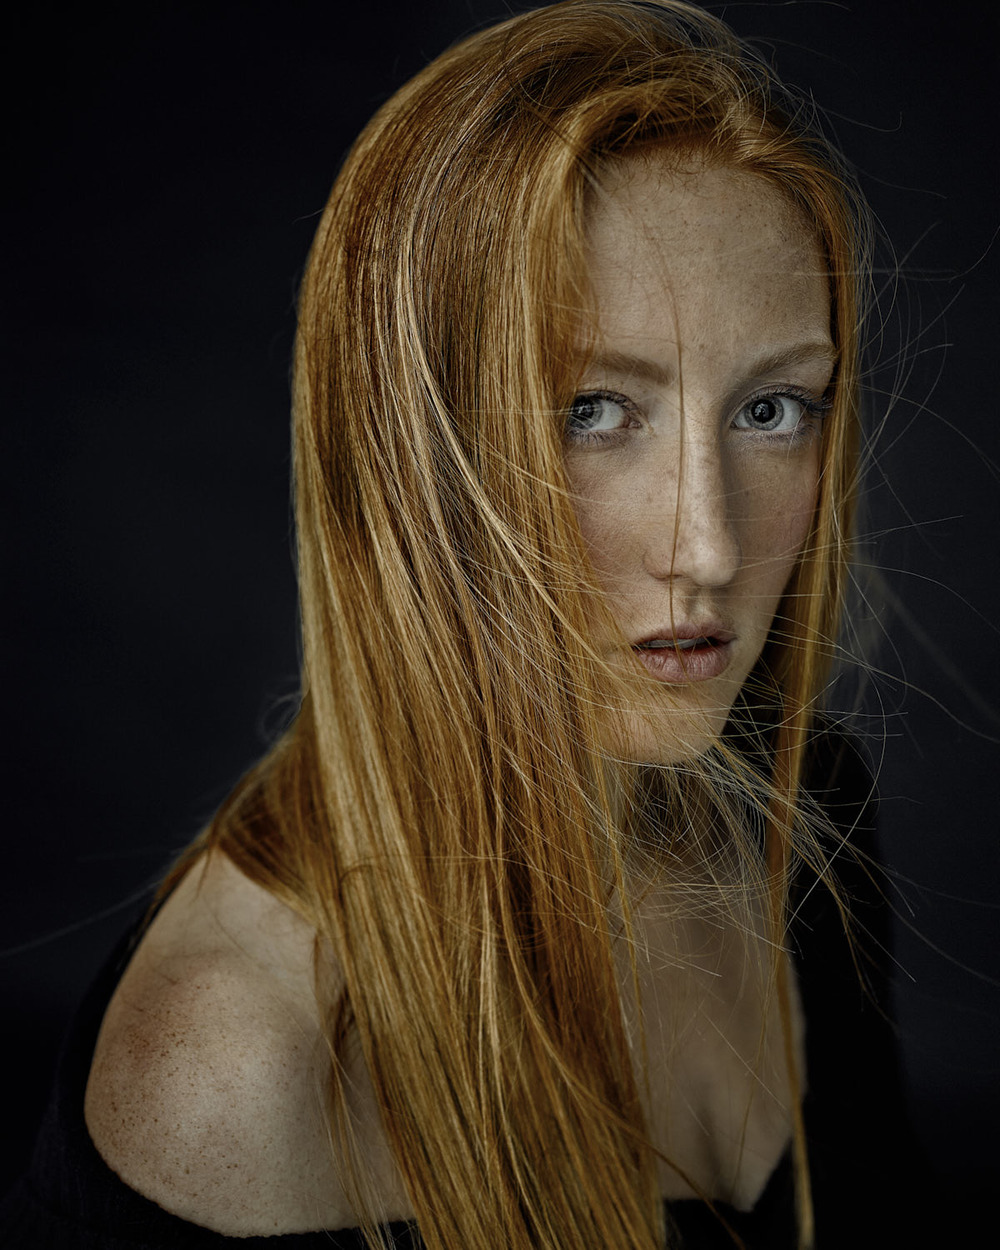 kiriako_iatridis_advertising_commercial_editorial_portrait_photography_photographer_photographers_regina_saskatchewan_canadian_best_Emma Caleval - Test SHoot - Aug 201526192.jpg